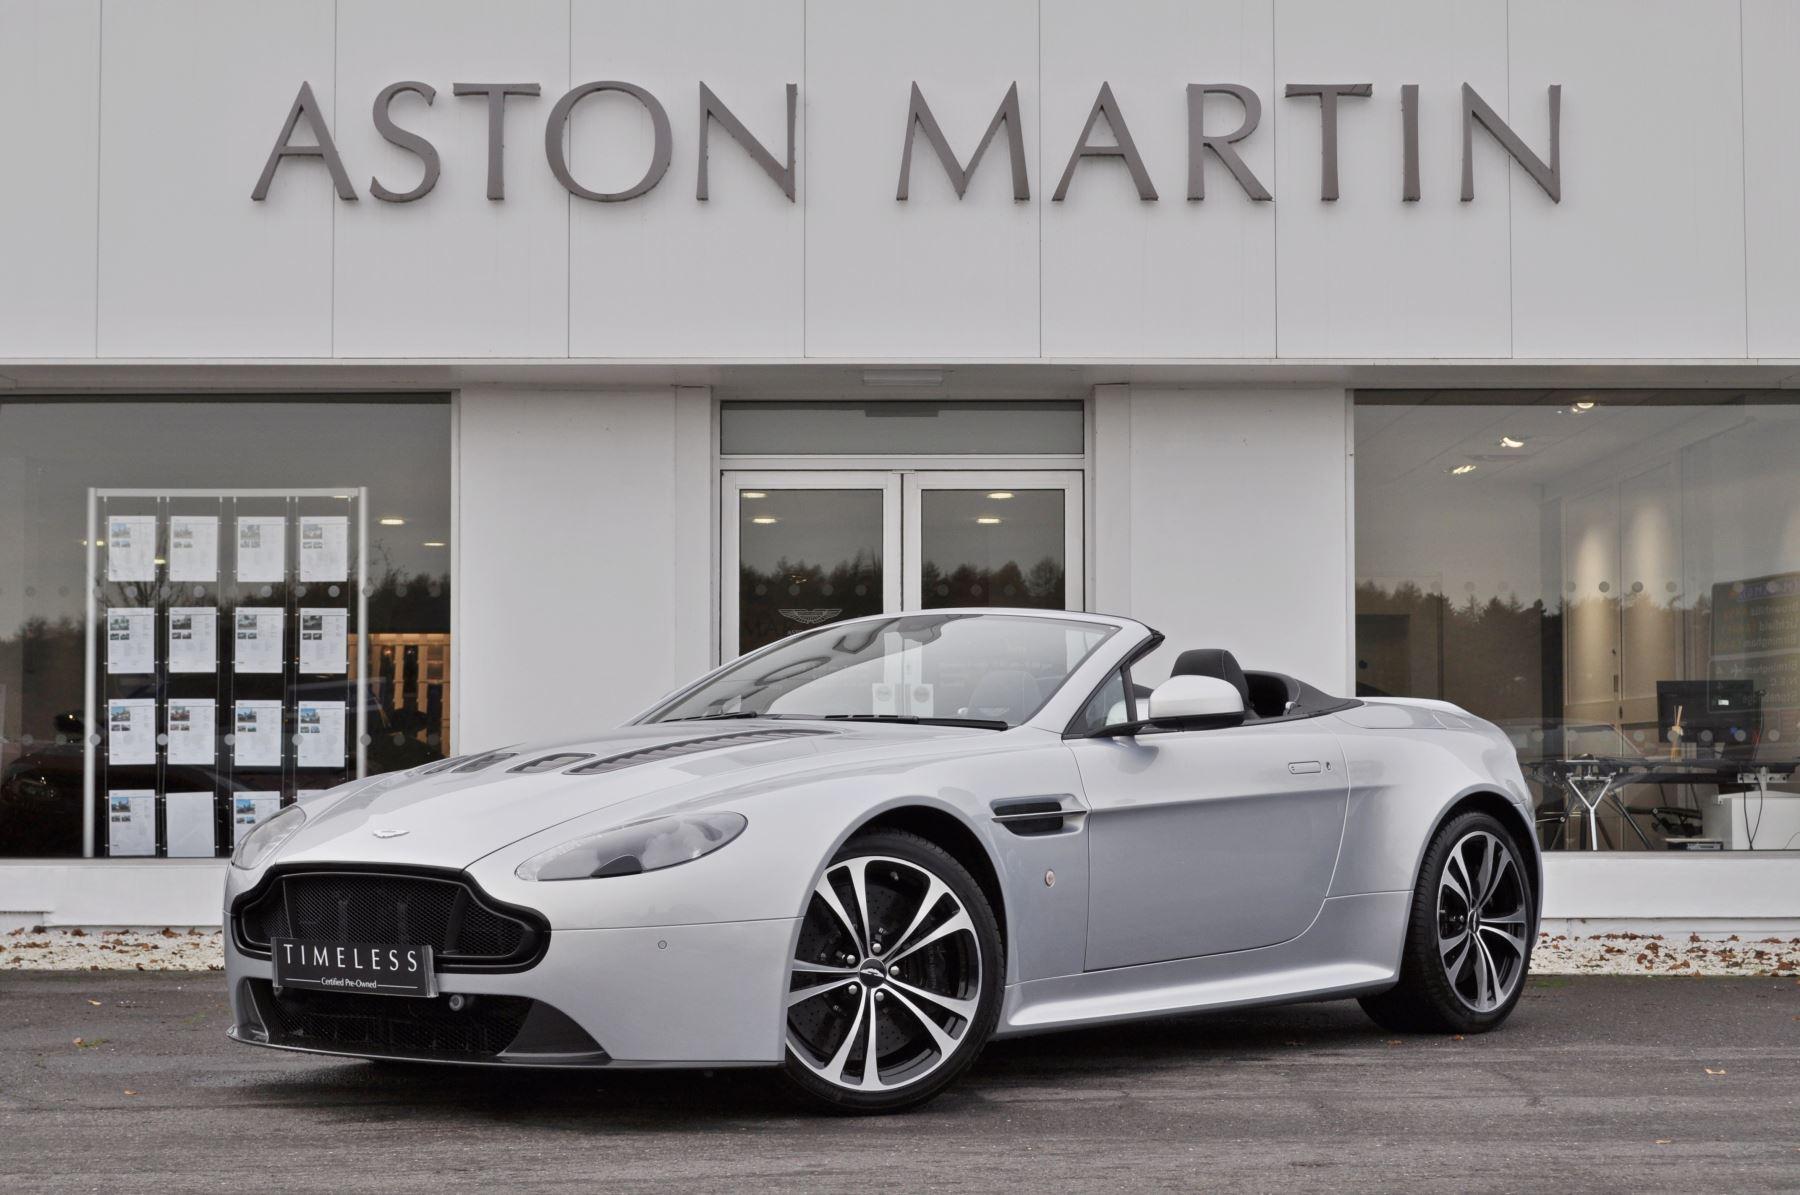 Aston Martin V12 Vantage S S 2dr Sportshift III 5.9 Automatic Roadster (2016) image